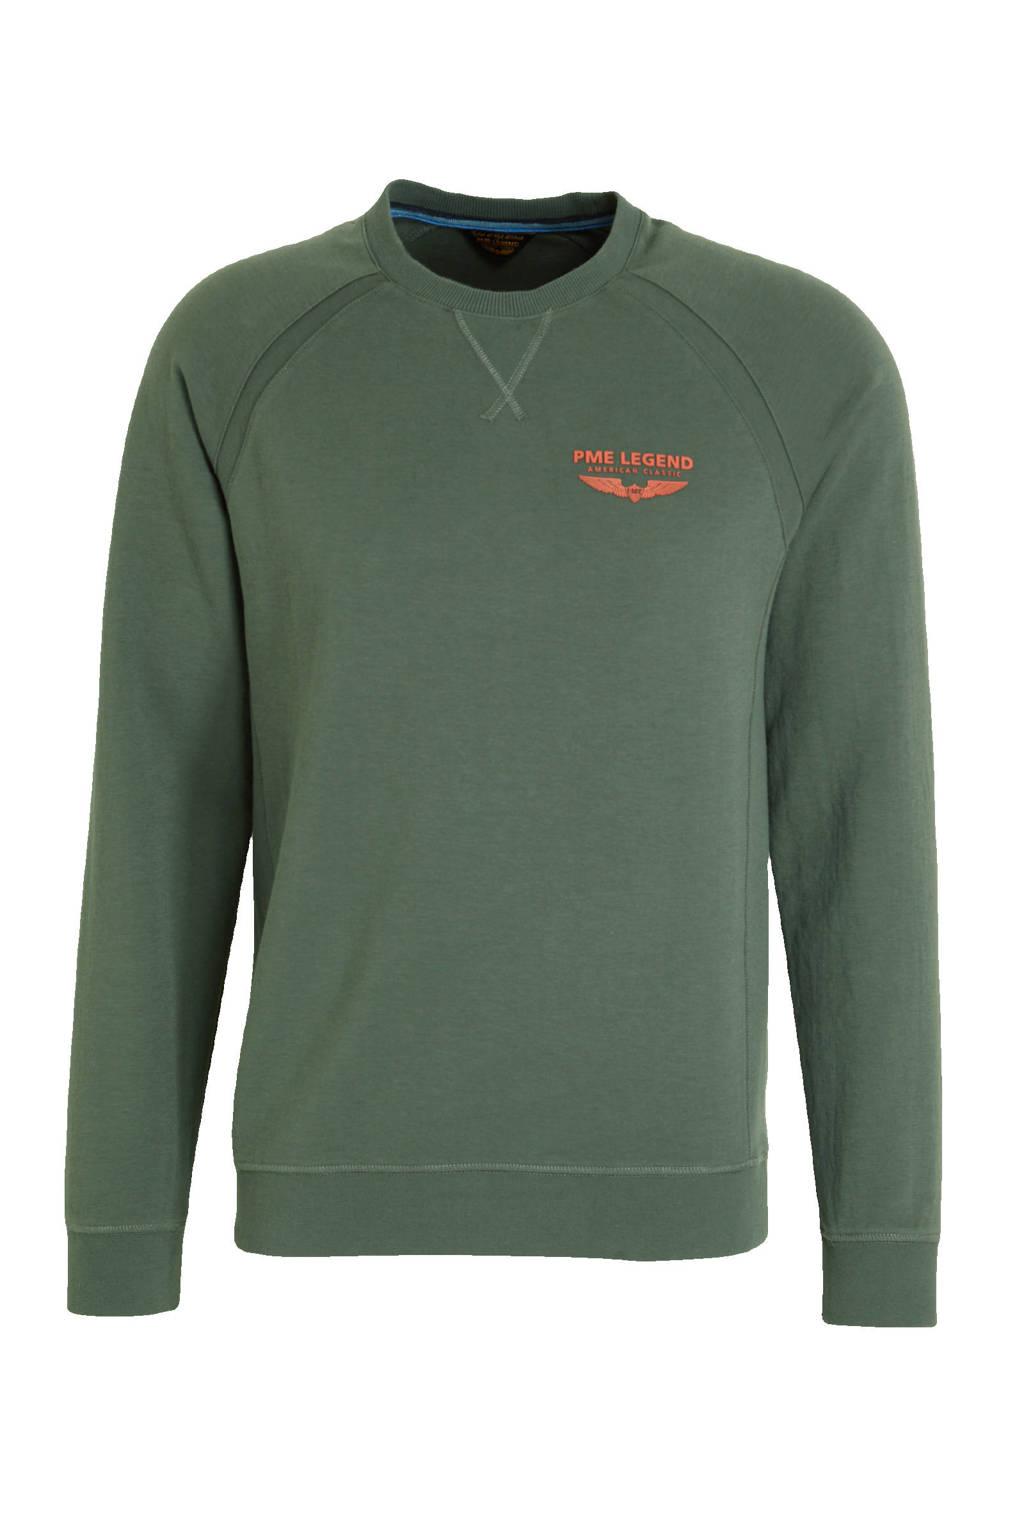 PME Legend sweater urban chic, Urban chic